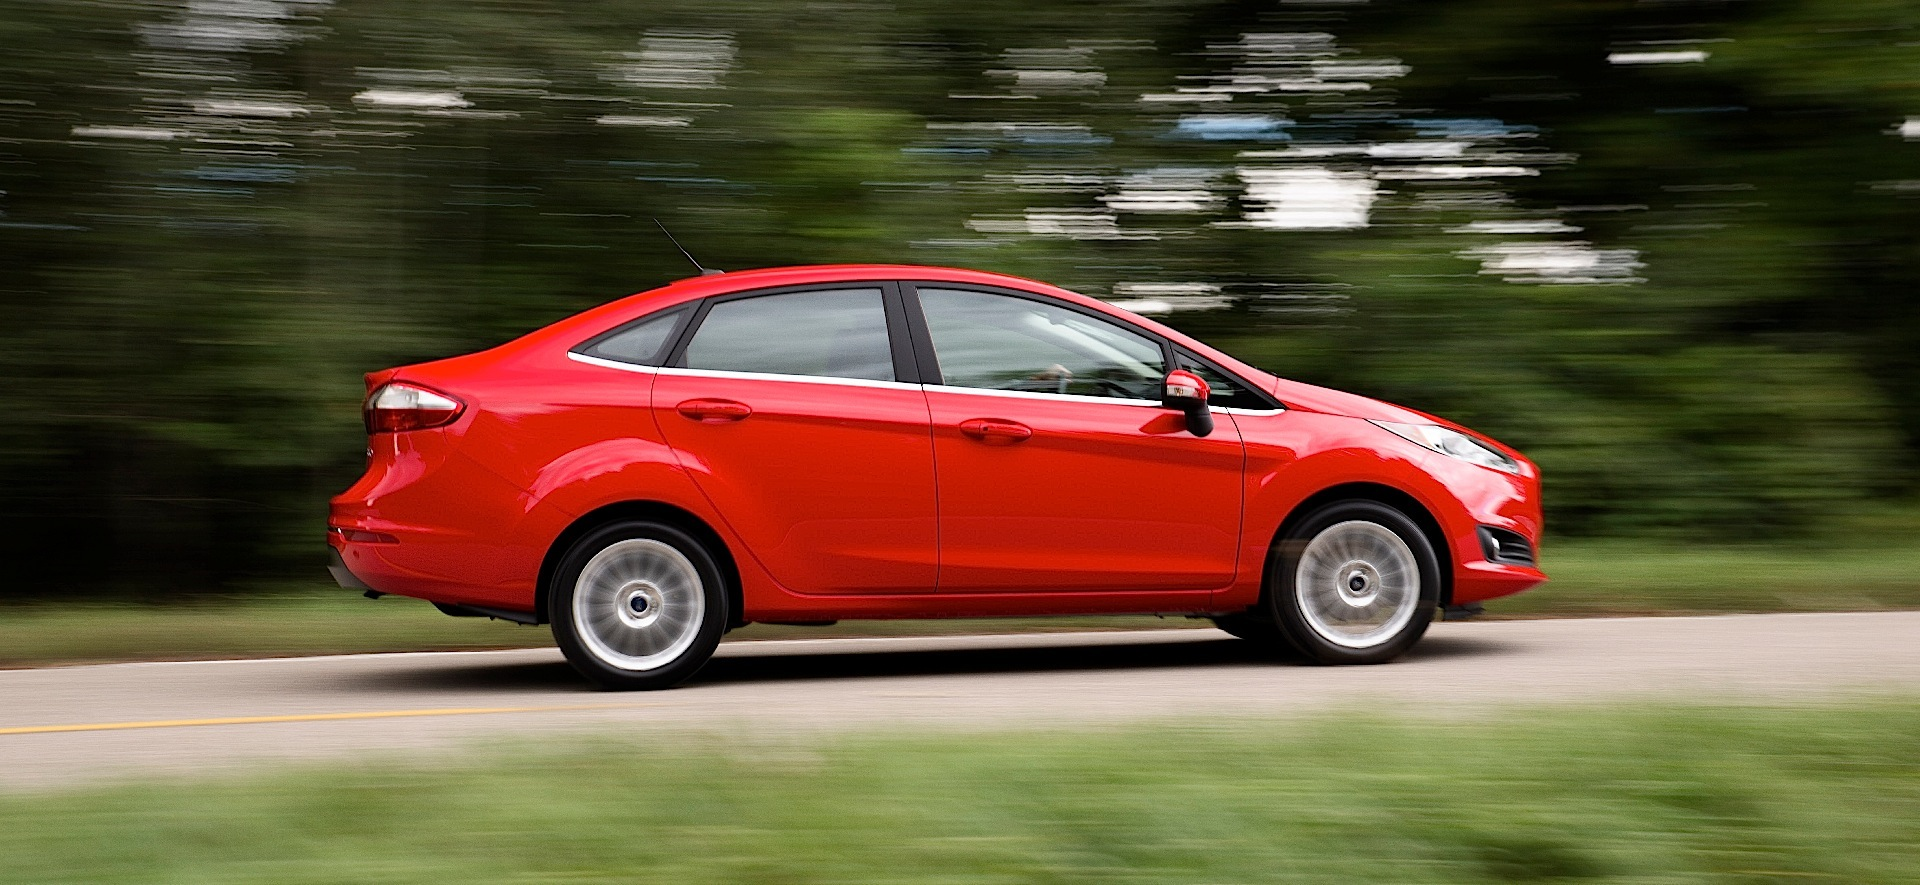 FORD Fiesta Sedan specs & photos - 2011, 2012, 2013, 2014, 2015, 2016, 2017, 2018, 2019 ...